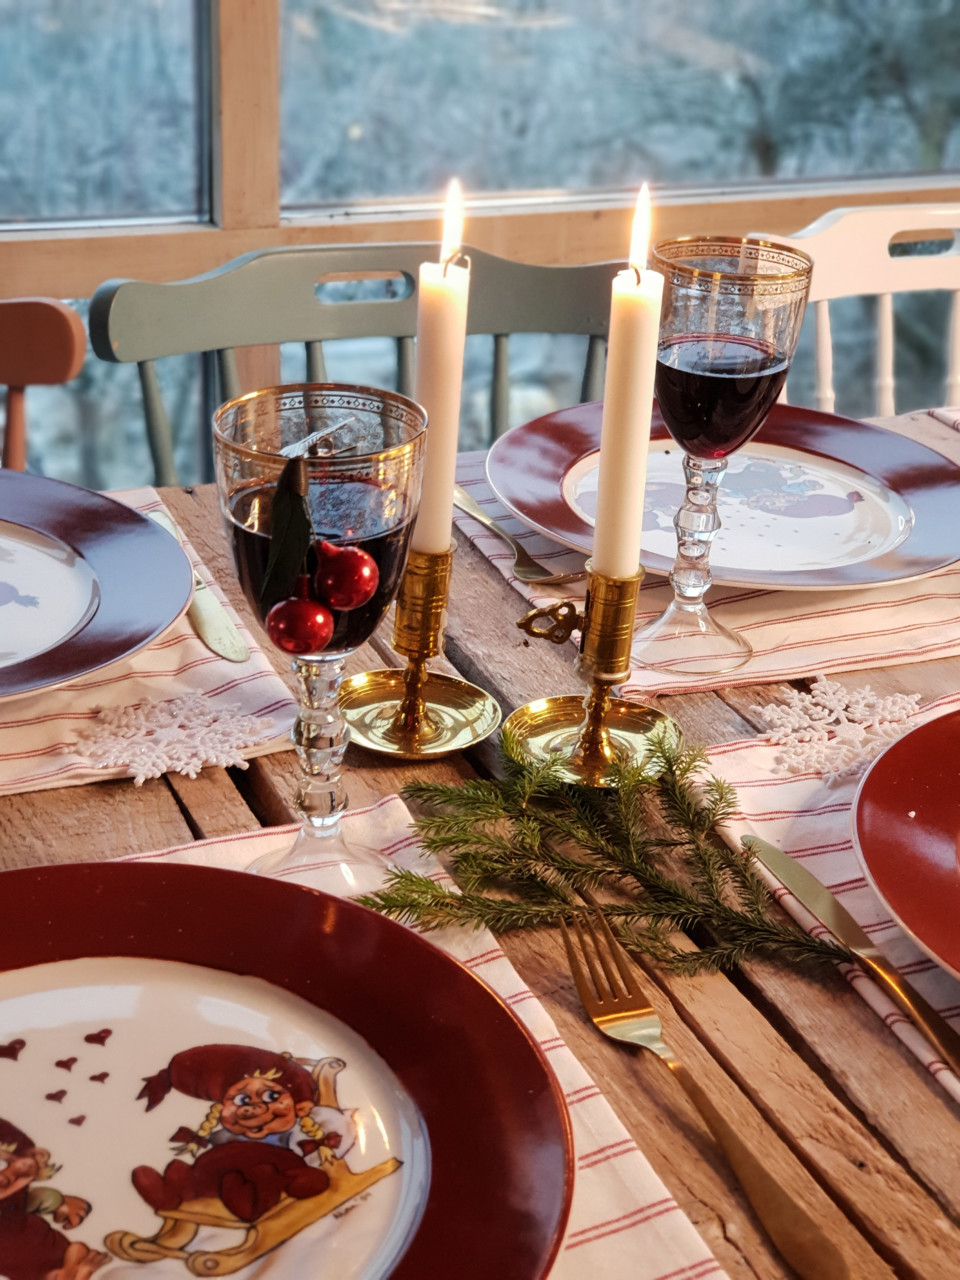 julebord-lys-kirsebaerhagen-christina-fraas-green-house